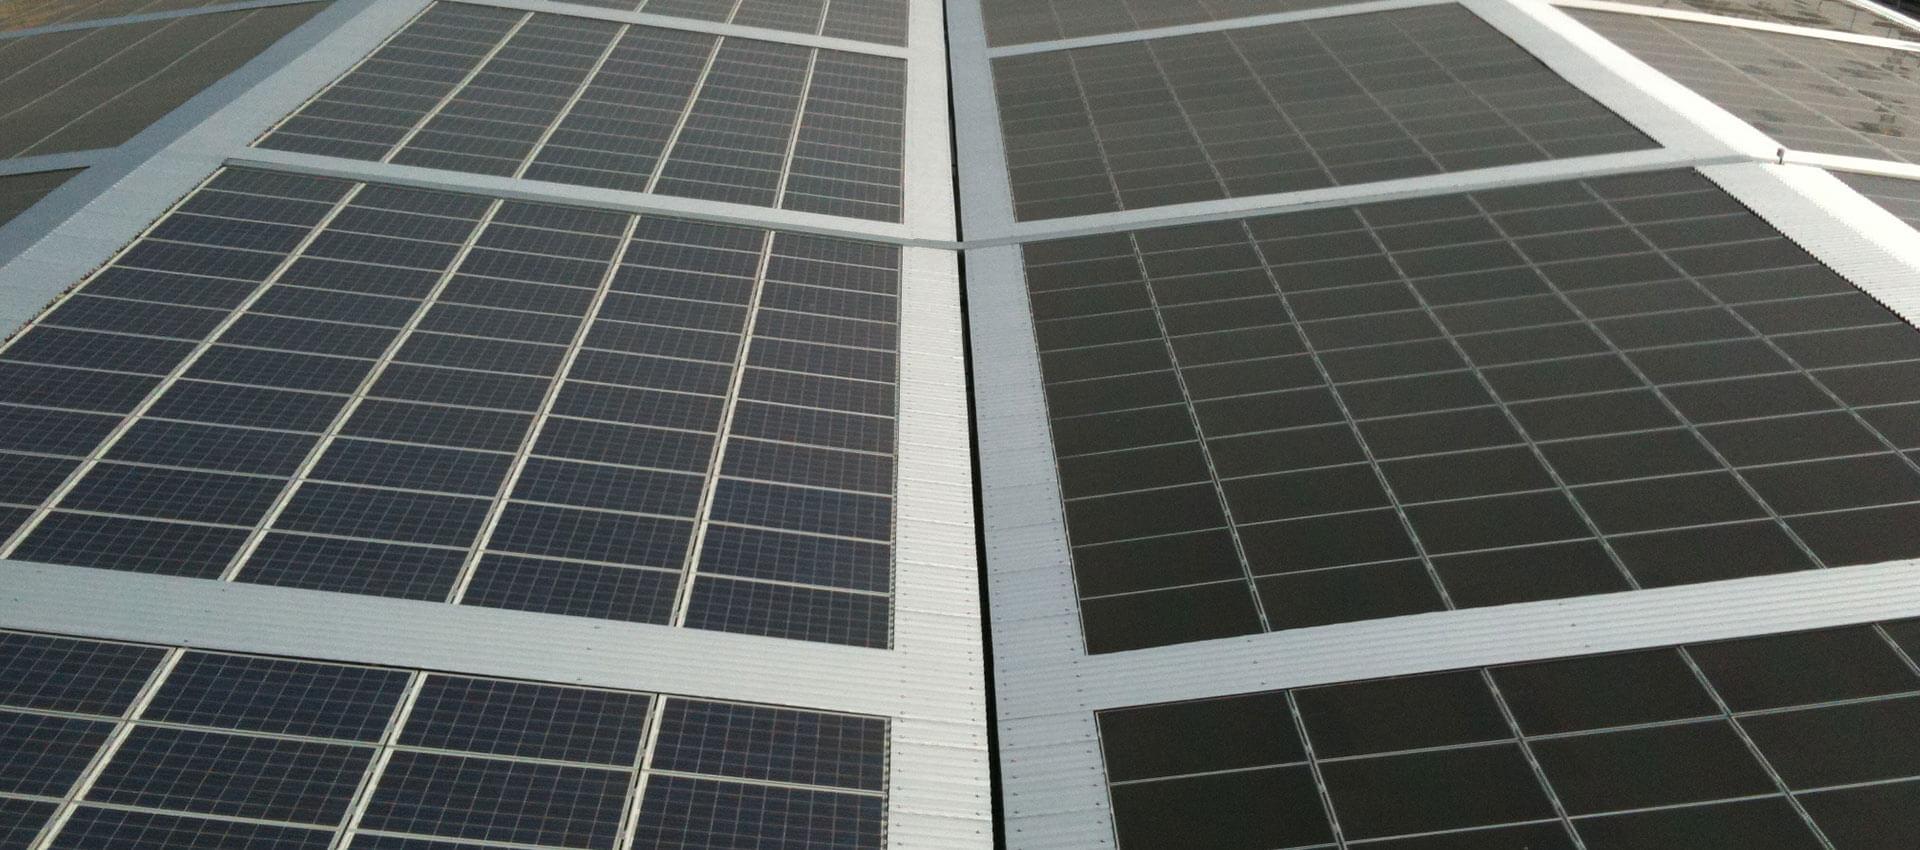 3 risparmio energetico